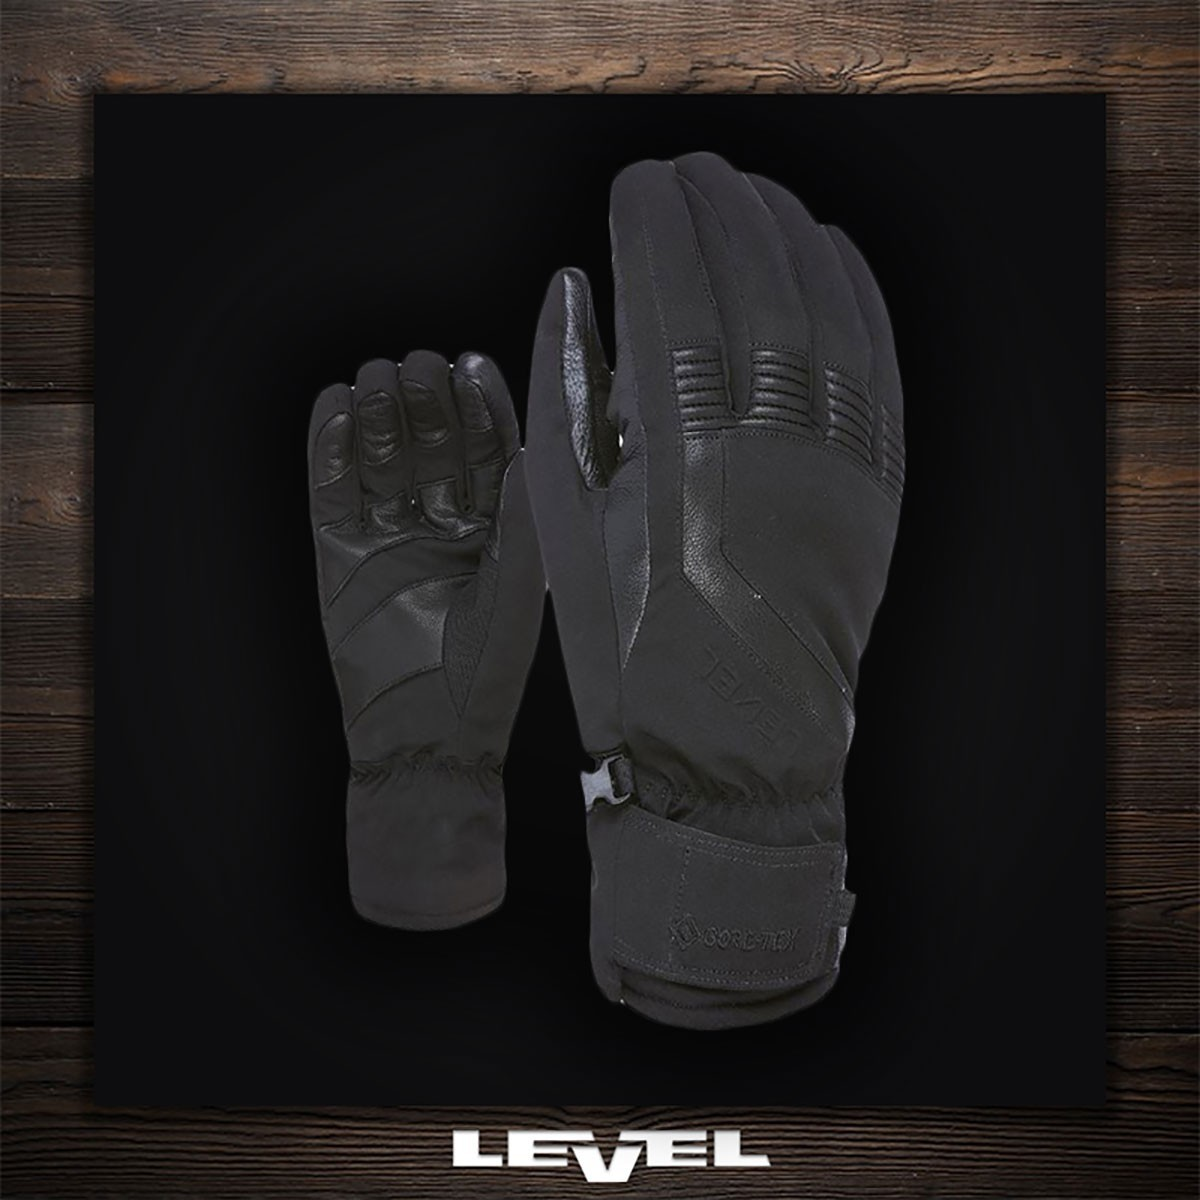 LEVEL I-SUPER RADIATOR GORE-TEX black - Изображение - AQUAMATRIX